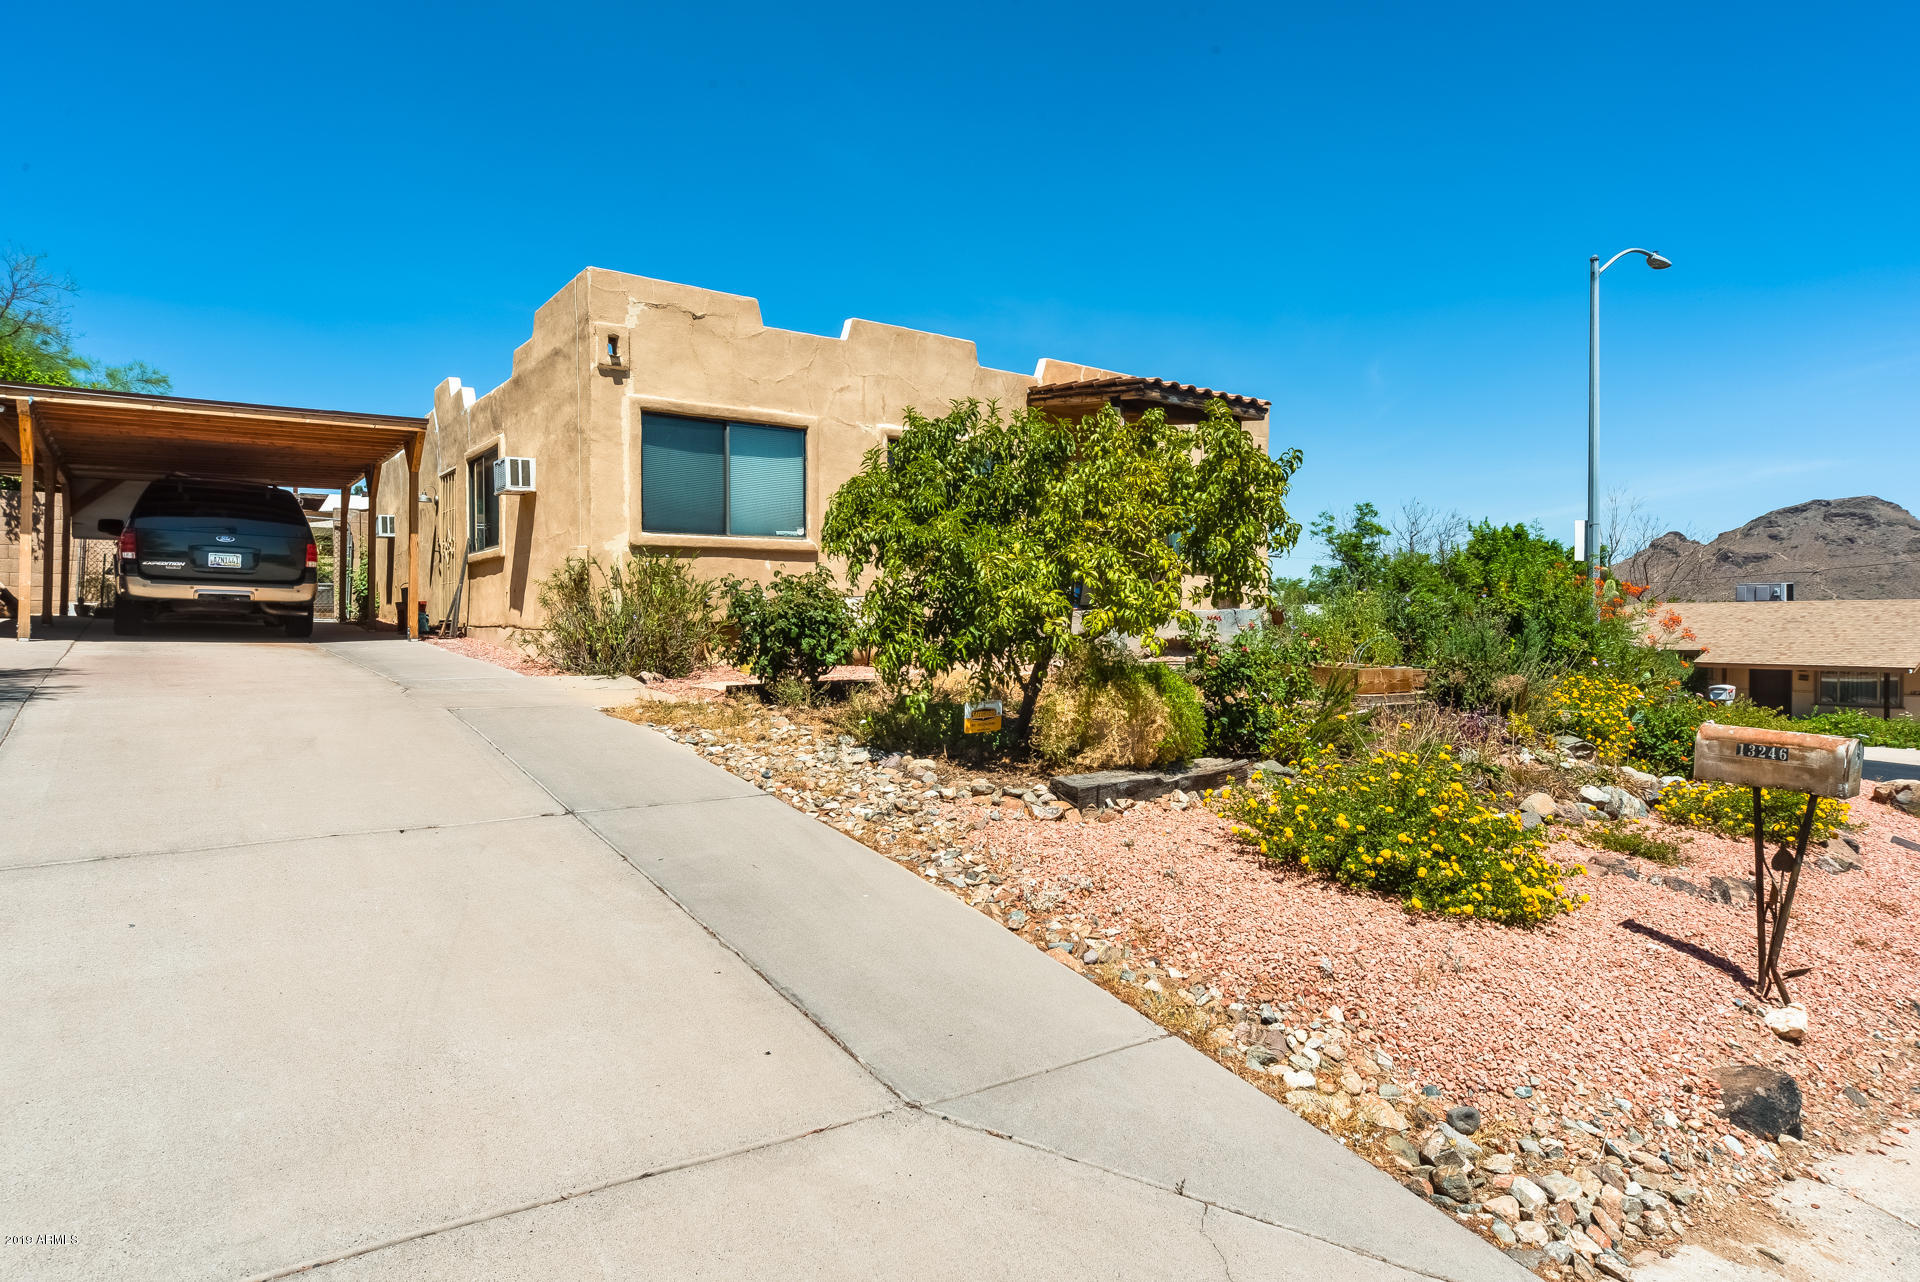 Photo of 13246 N 18TH Place, Phoenix, AZ 85022